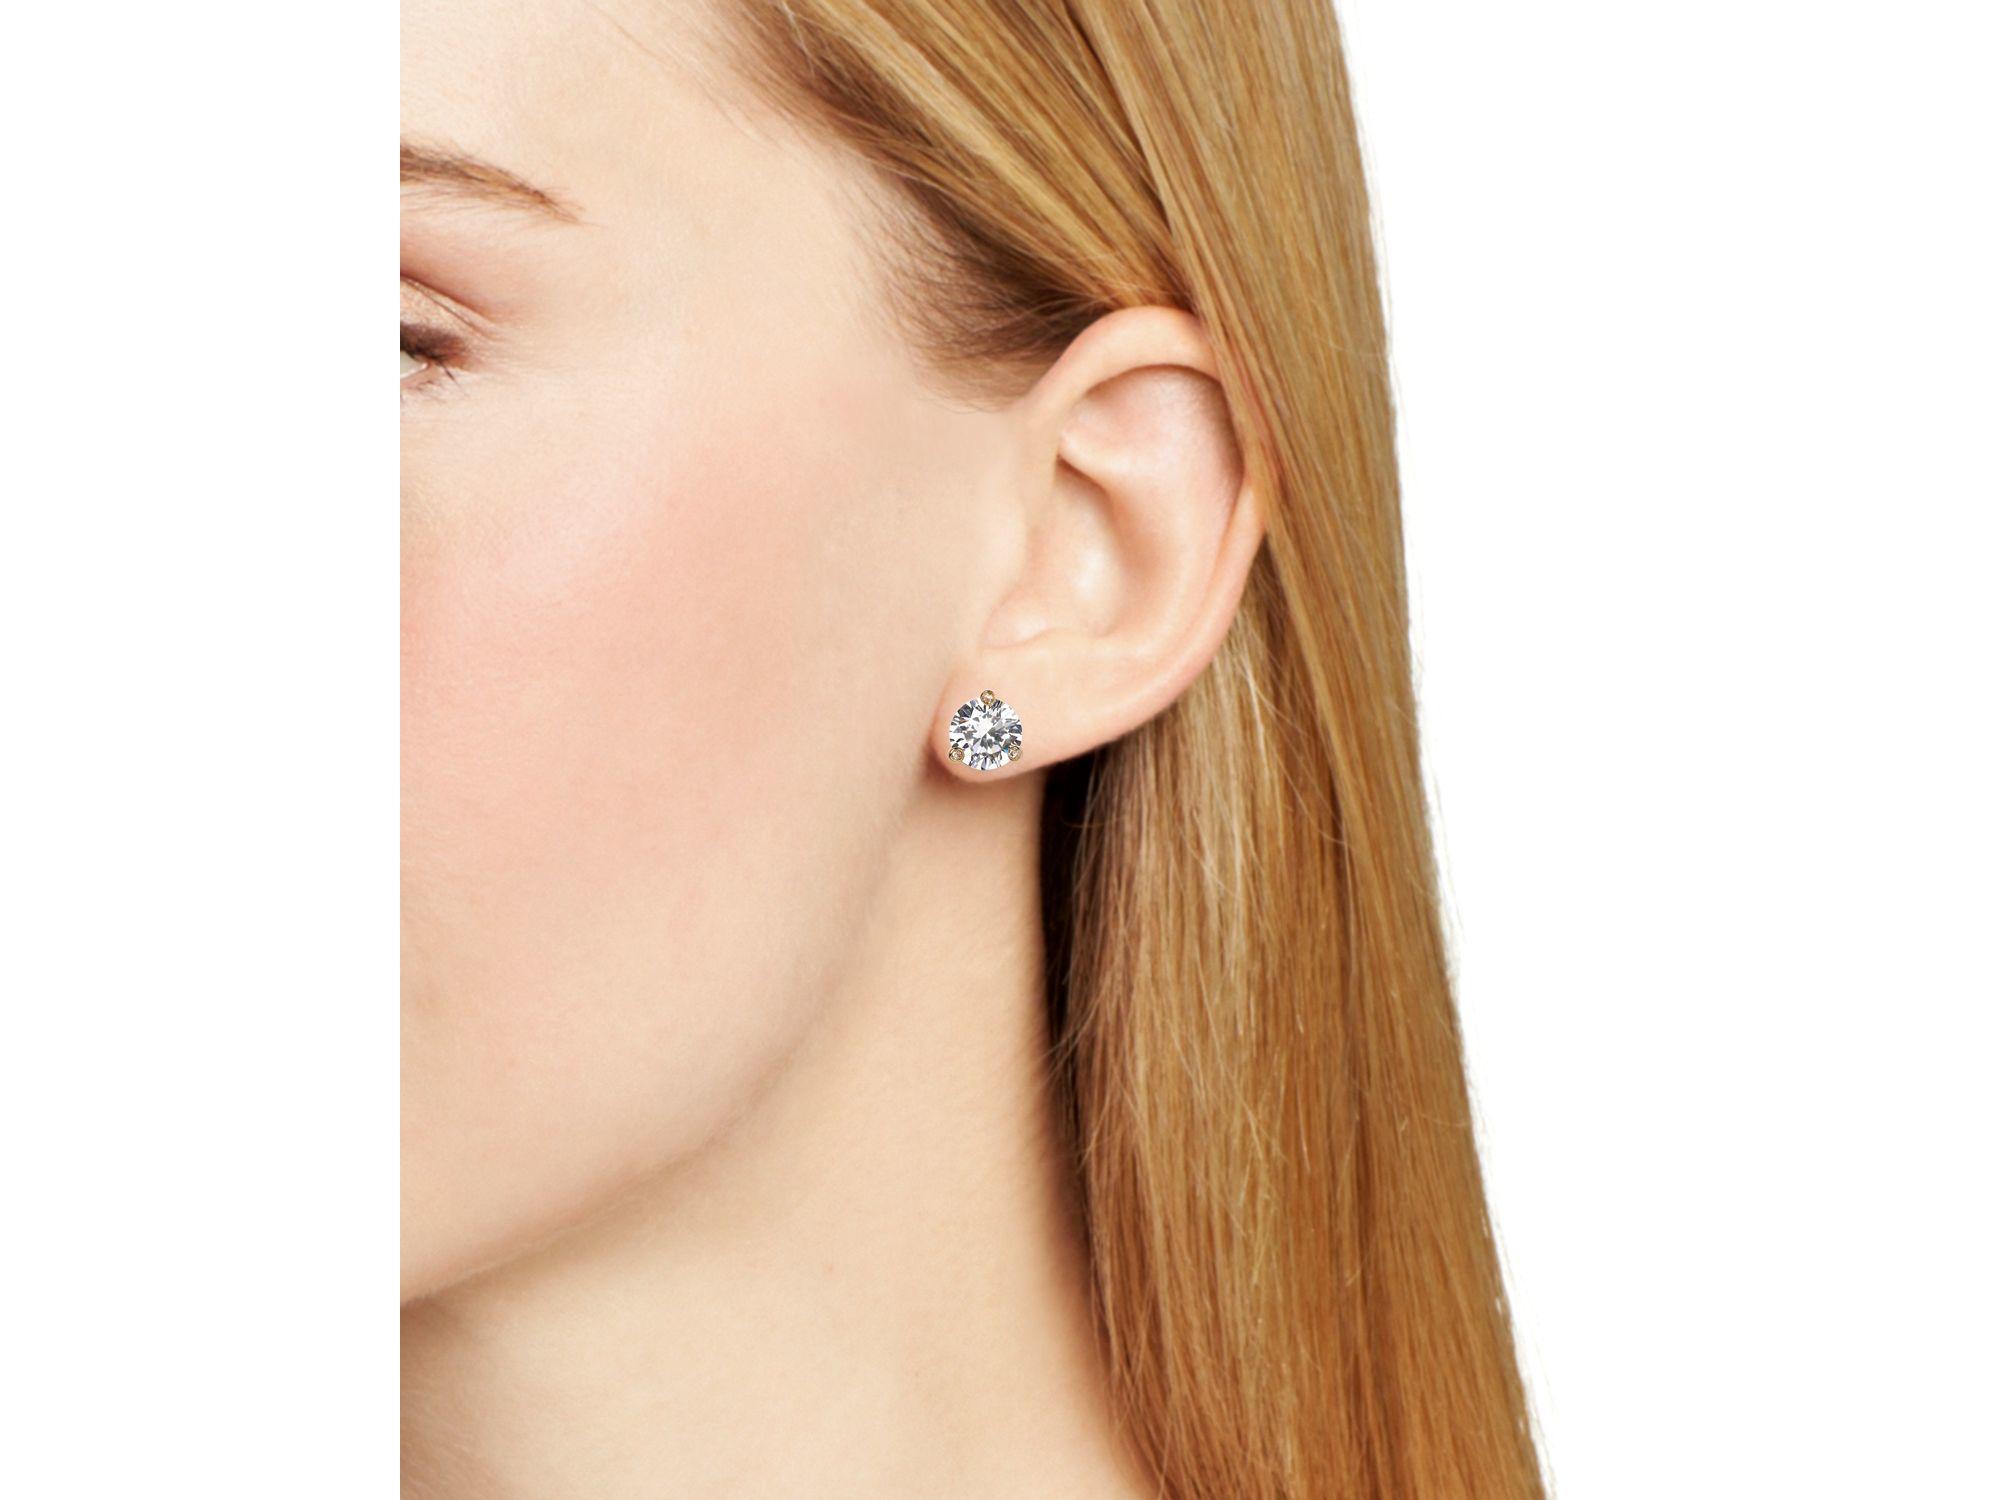 Kate Spade New York Shine On Stud Earrings lHwmEwREyx